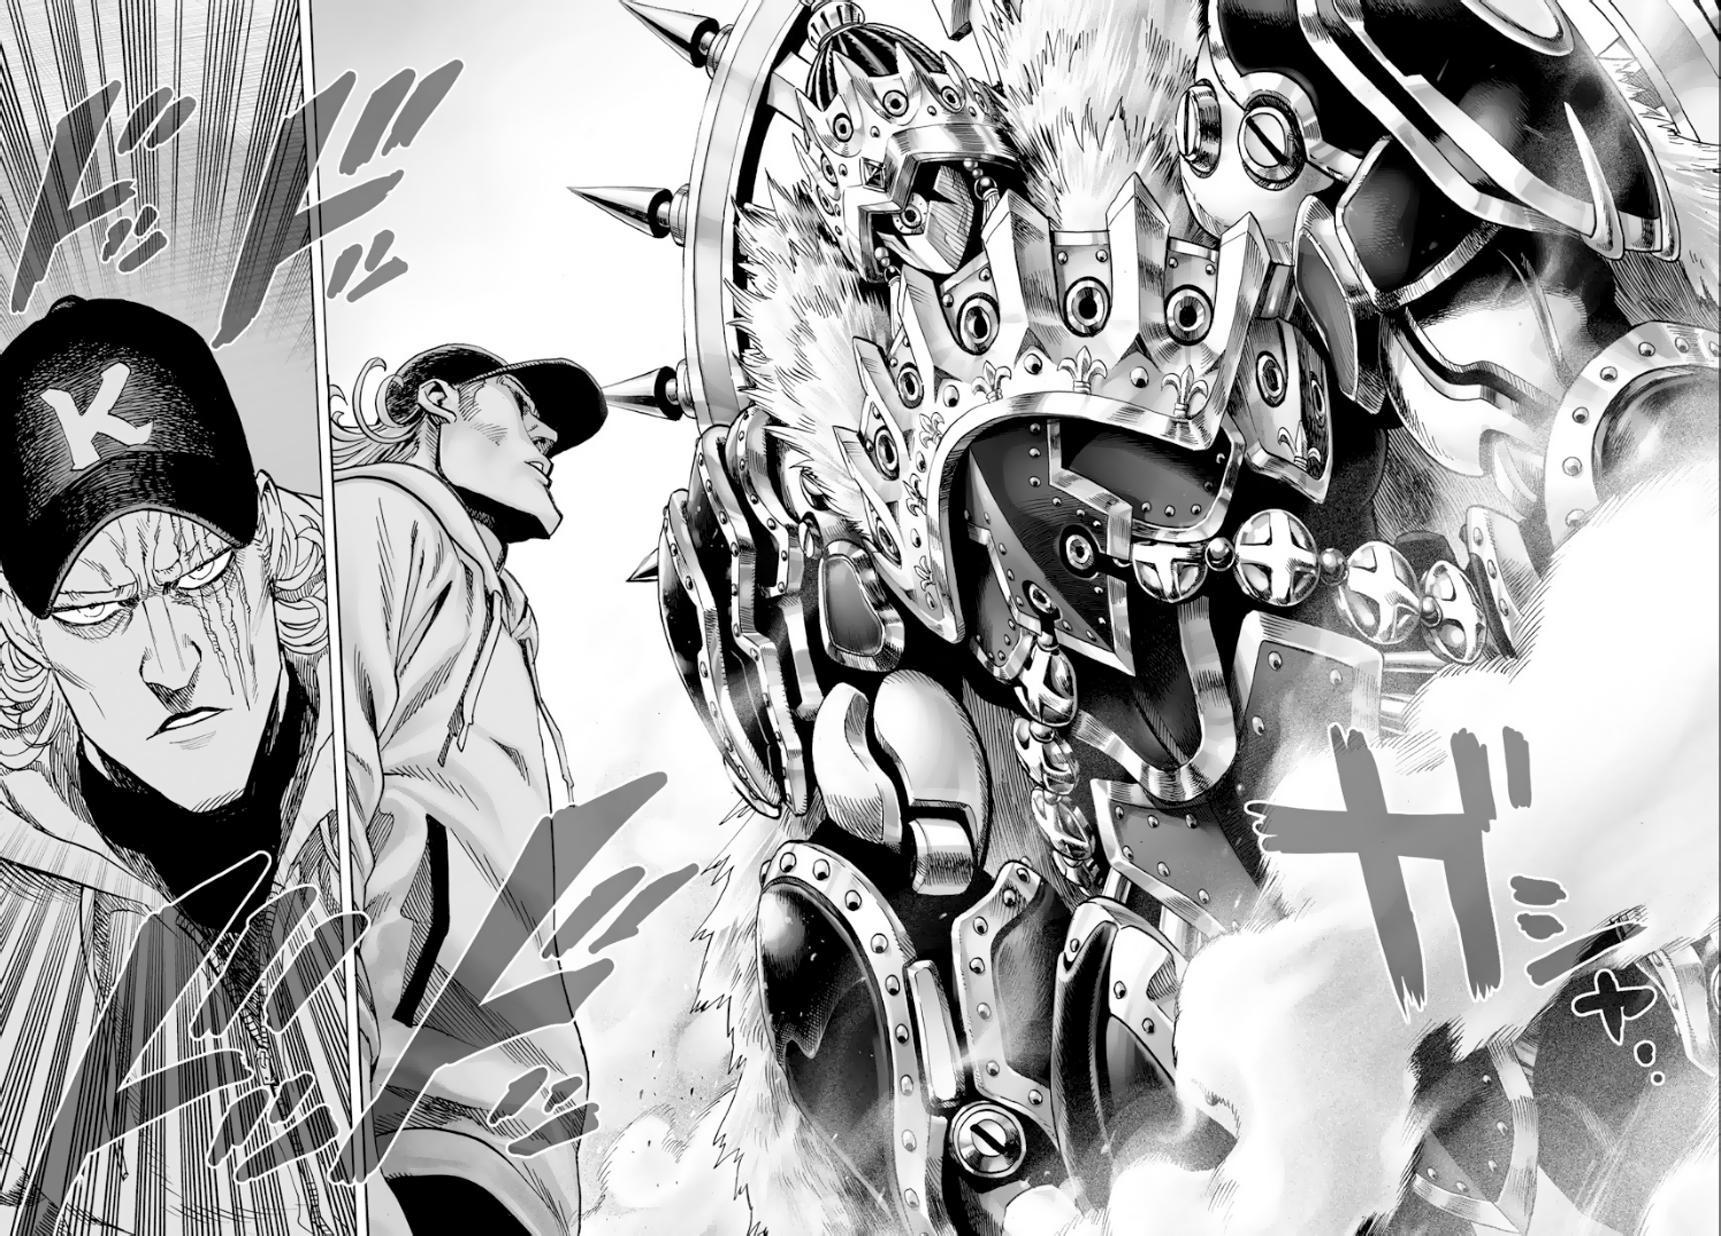 http://c5.ninemanga.com/es_manga/21/14805/362324/dbd3ba134d3d2fe1a92005092dd85a9b.jpg Page 5